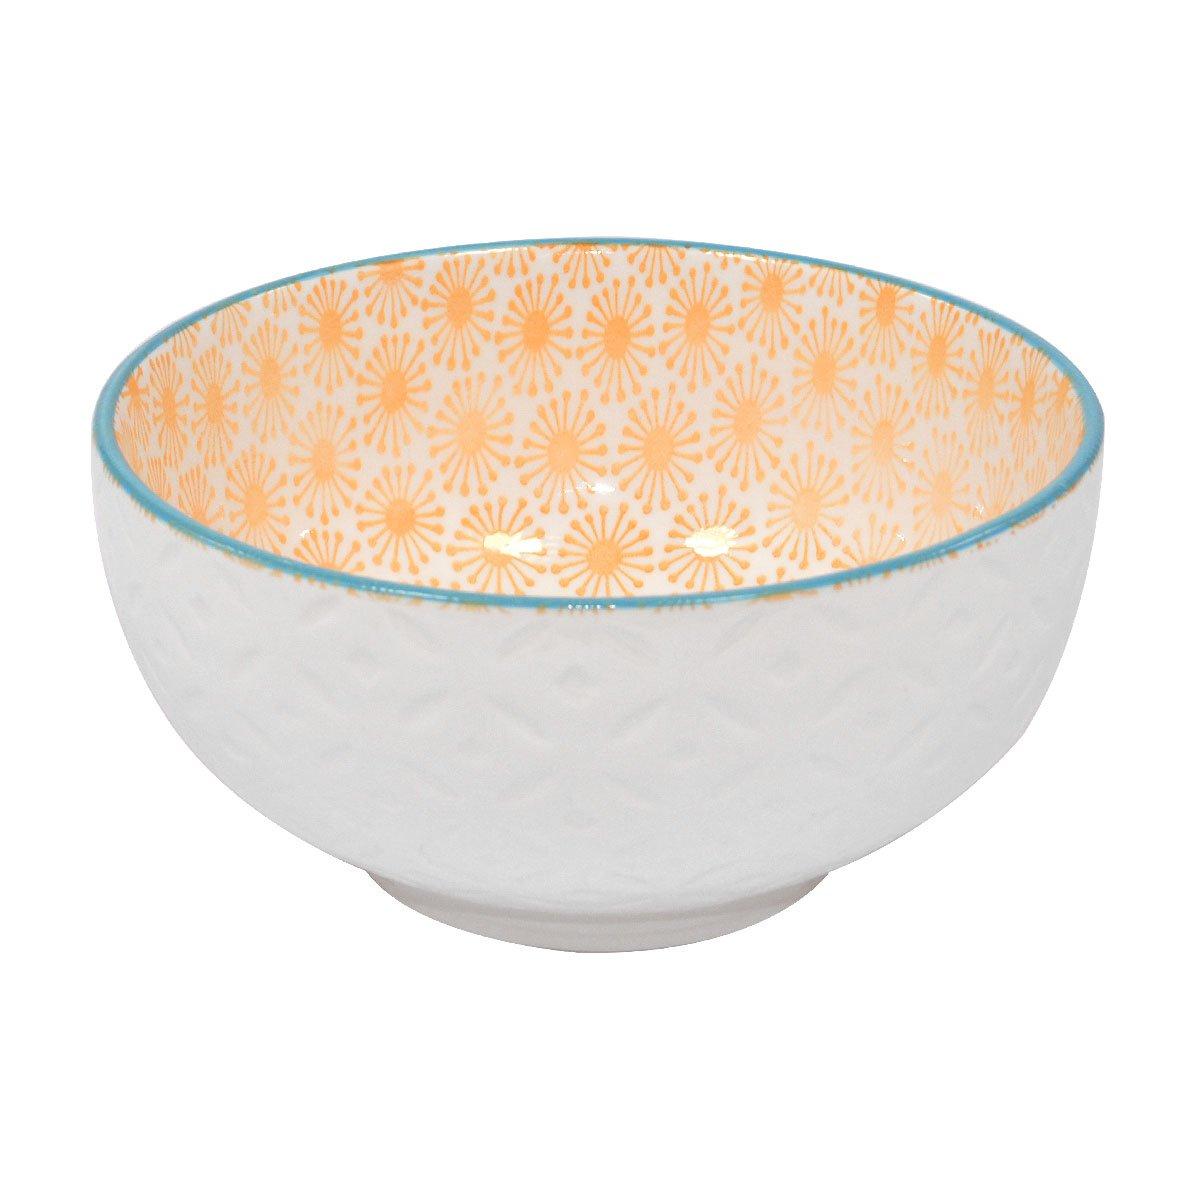 Bowl ~ Cereal/Pudding/Desert Ceramic Bowl ~ FLOWER Xpressions